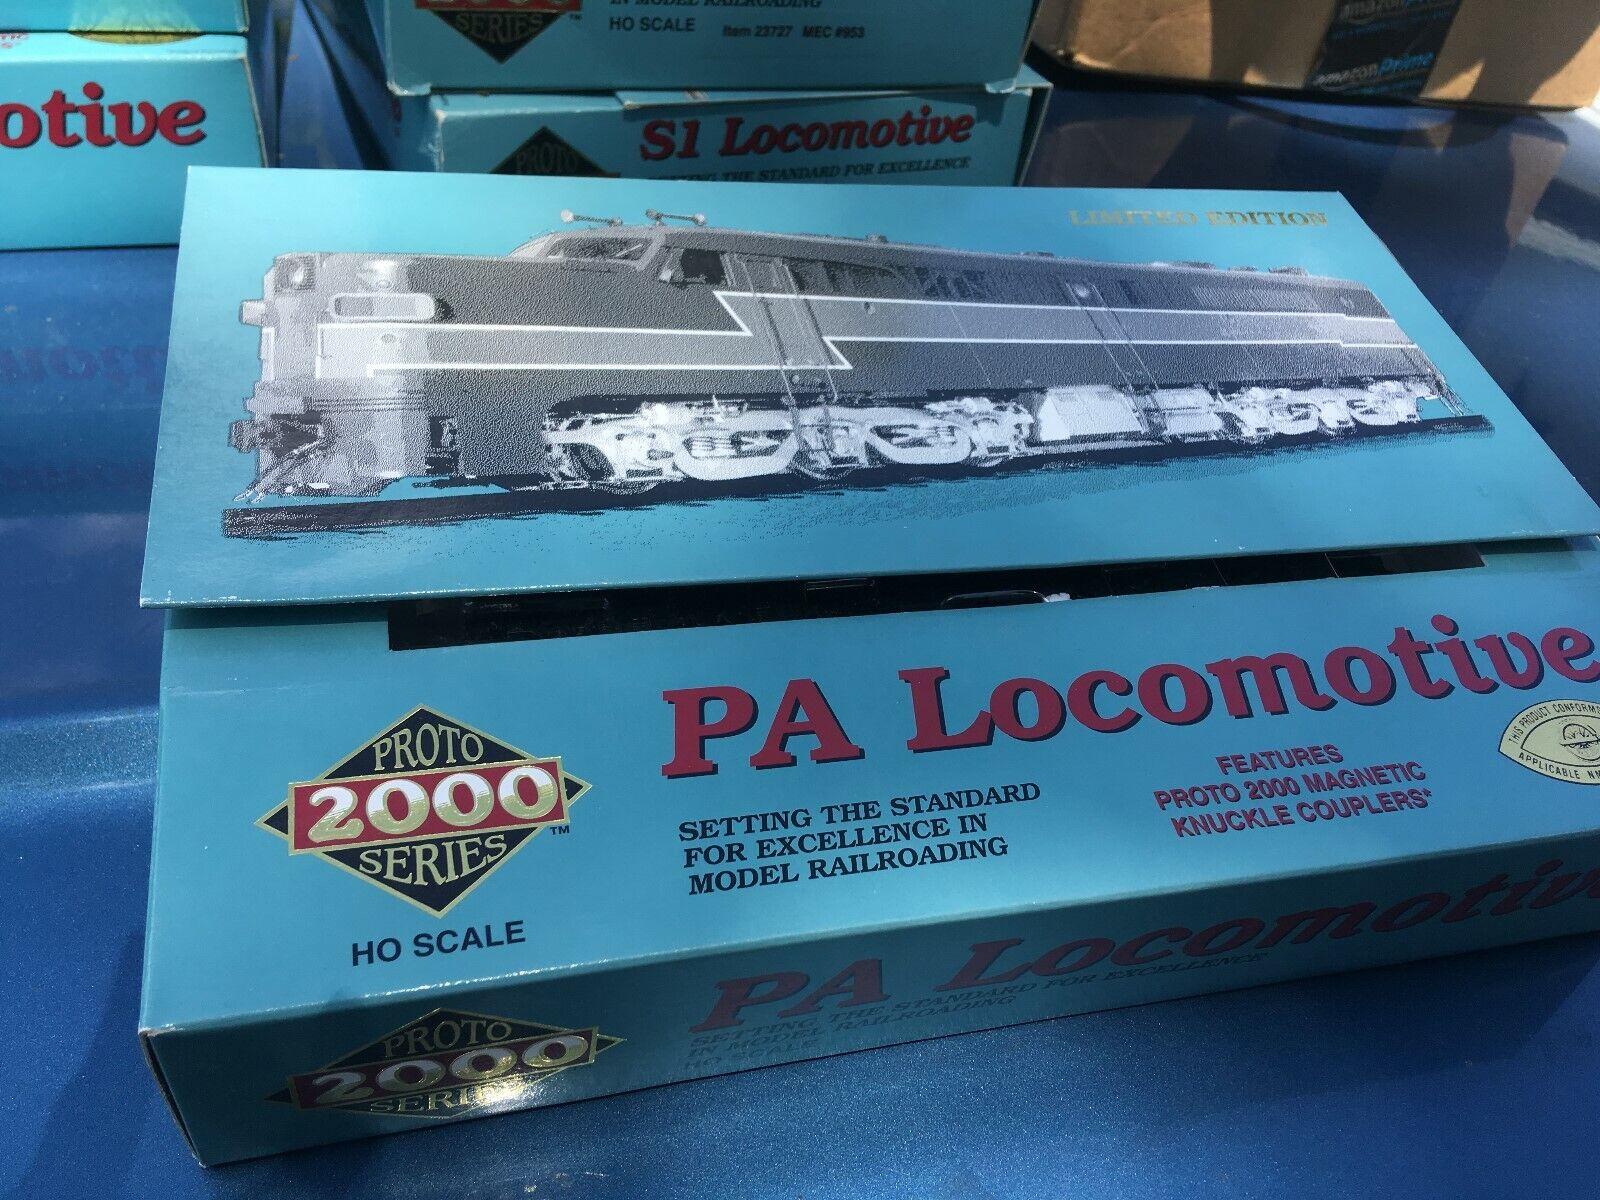 Projoo serie 2000 pa locomotoras New Haven 0762 0762 0762 828